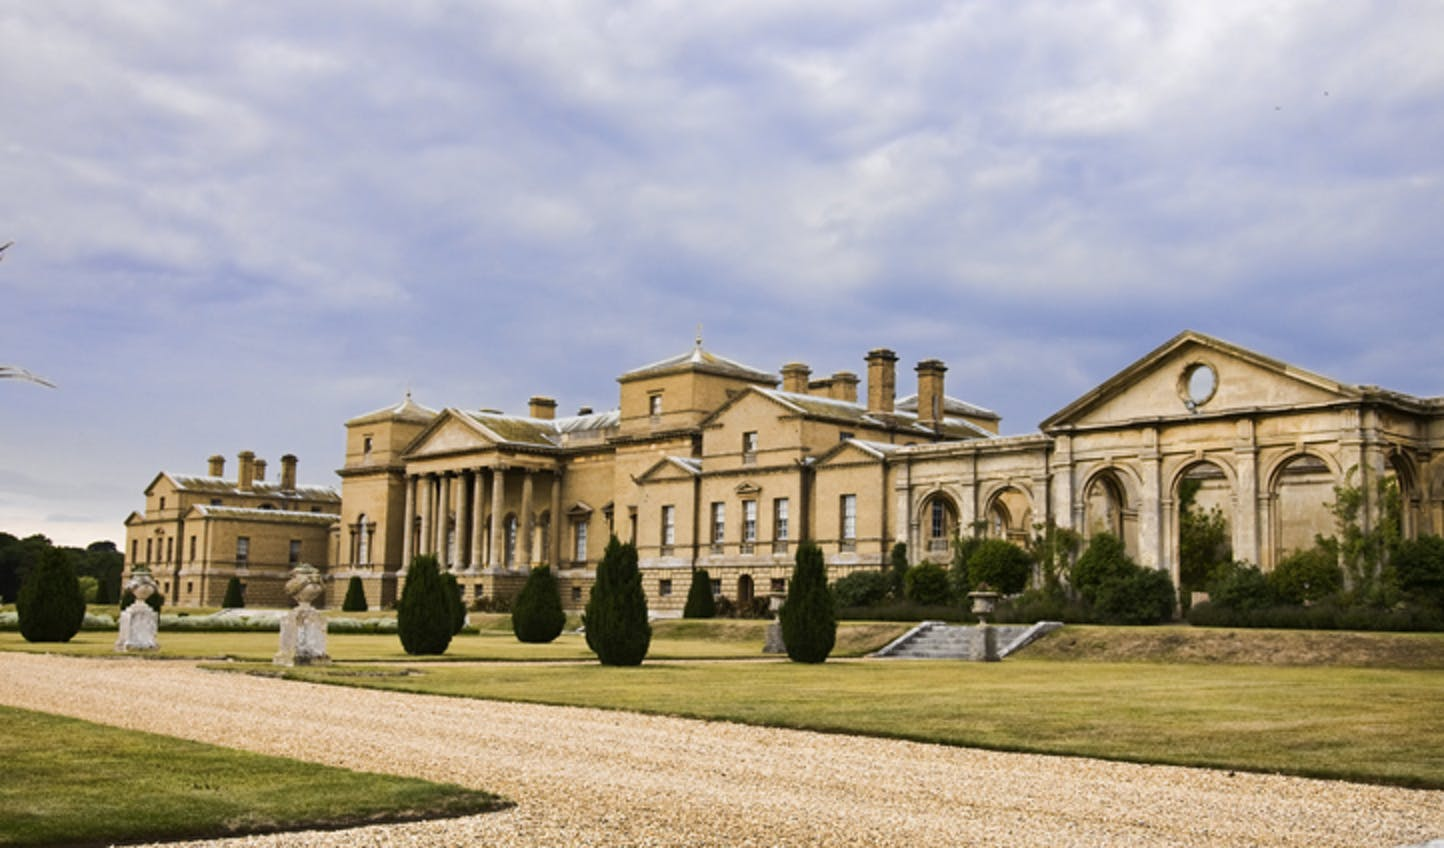 Royal Norfolk